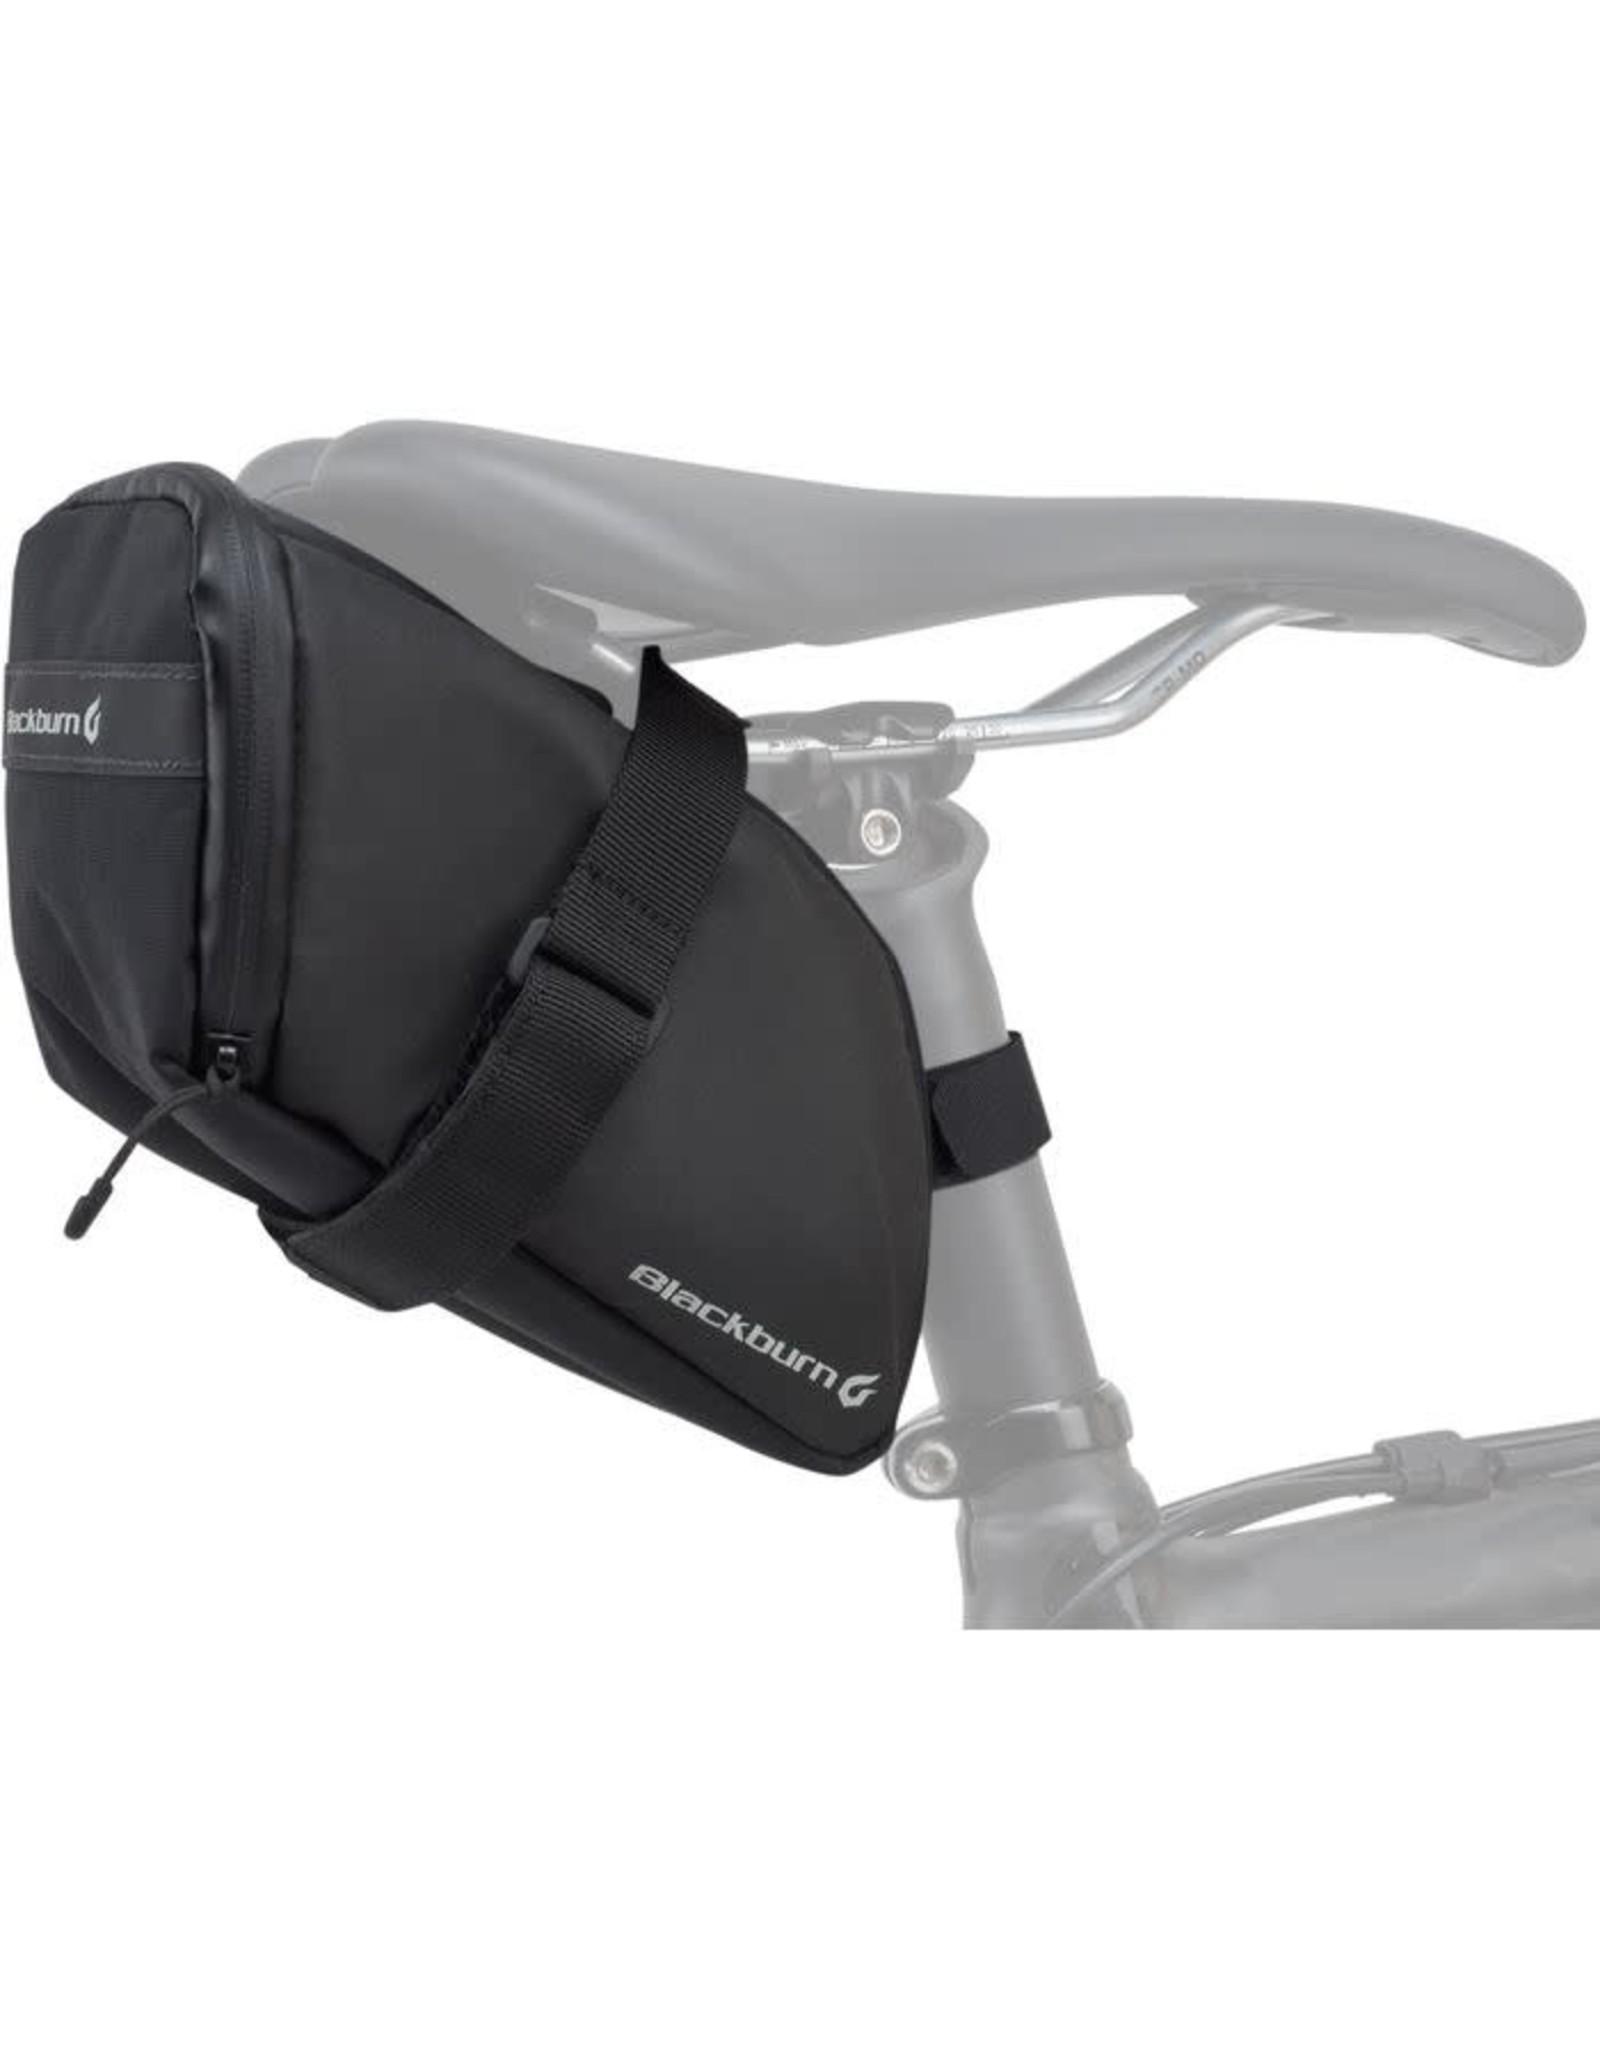 Blackburn Blackburn Grid Large Seat Bag - Black